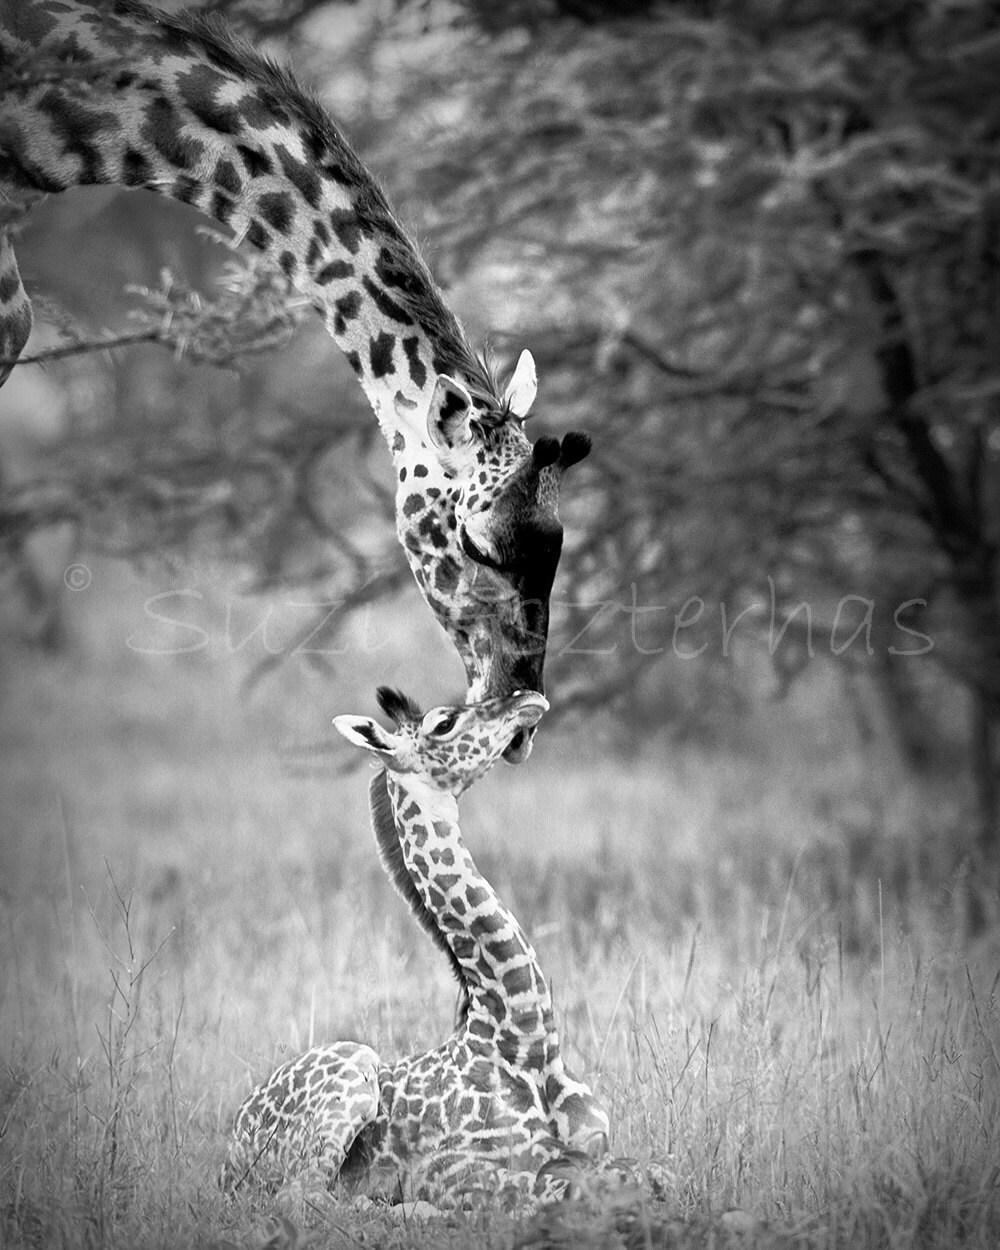 Baby Giraffe And Mom Black And White Photo By Babyanimalprints